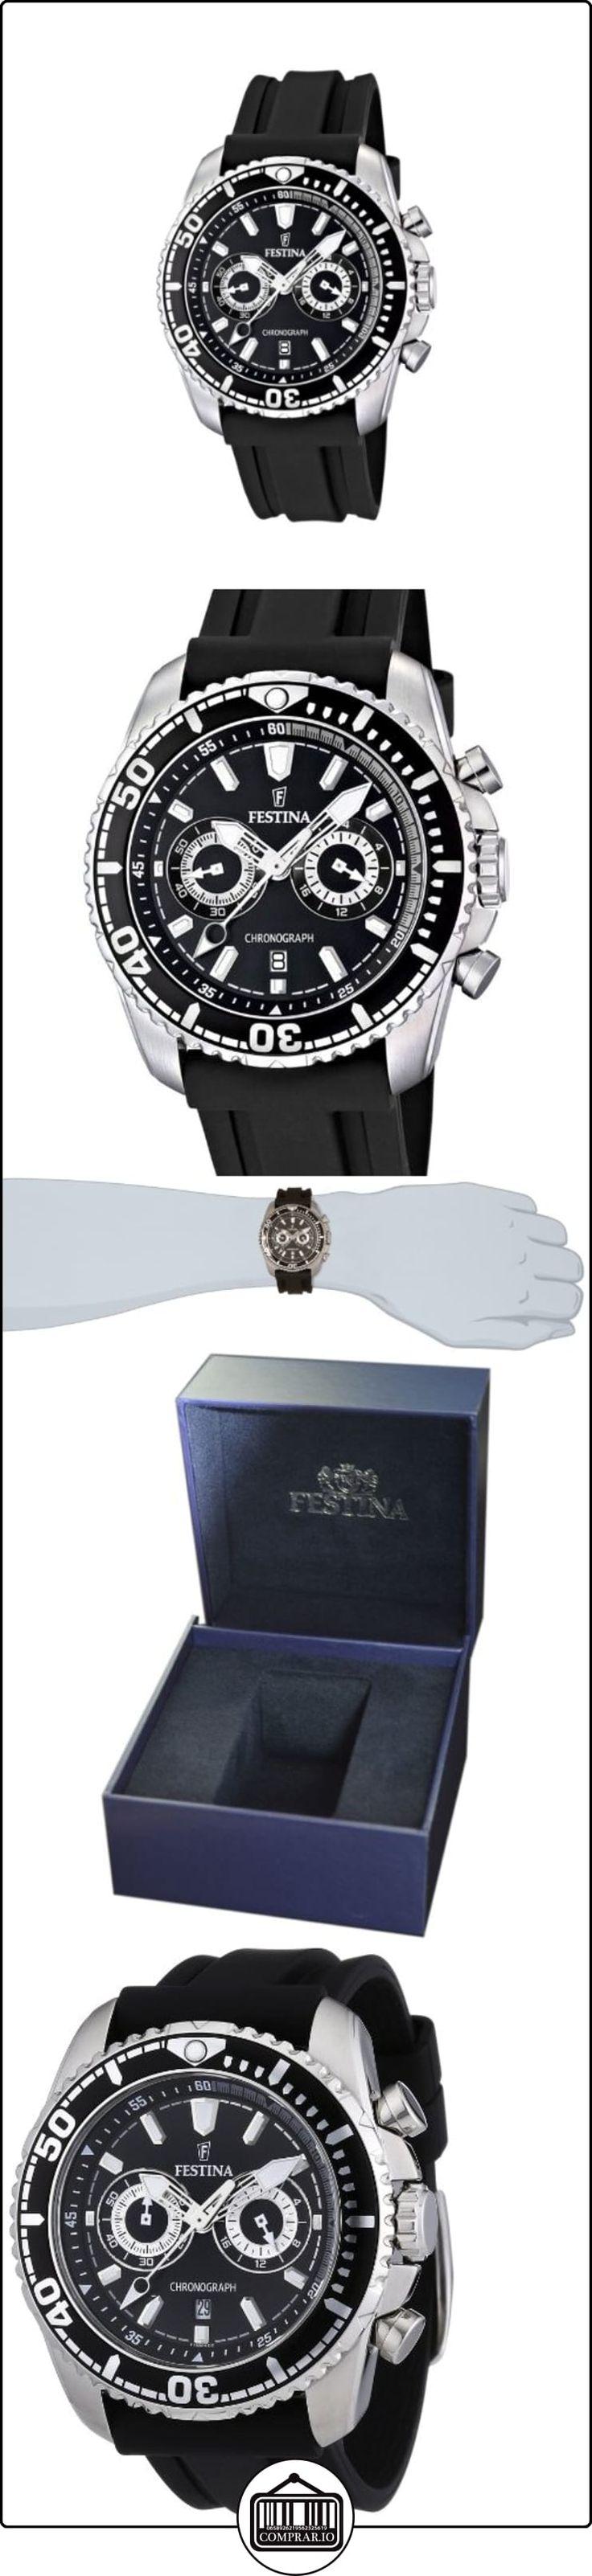 Festina F16574/4 - Reloj cronógrafo de cuarzo para hombre con correa de caucho, color negro  ✿ Relojes para hombre - (Gama media/alta) ✿